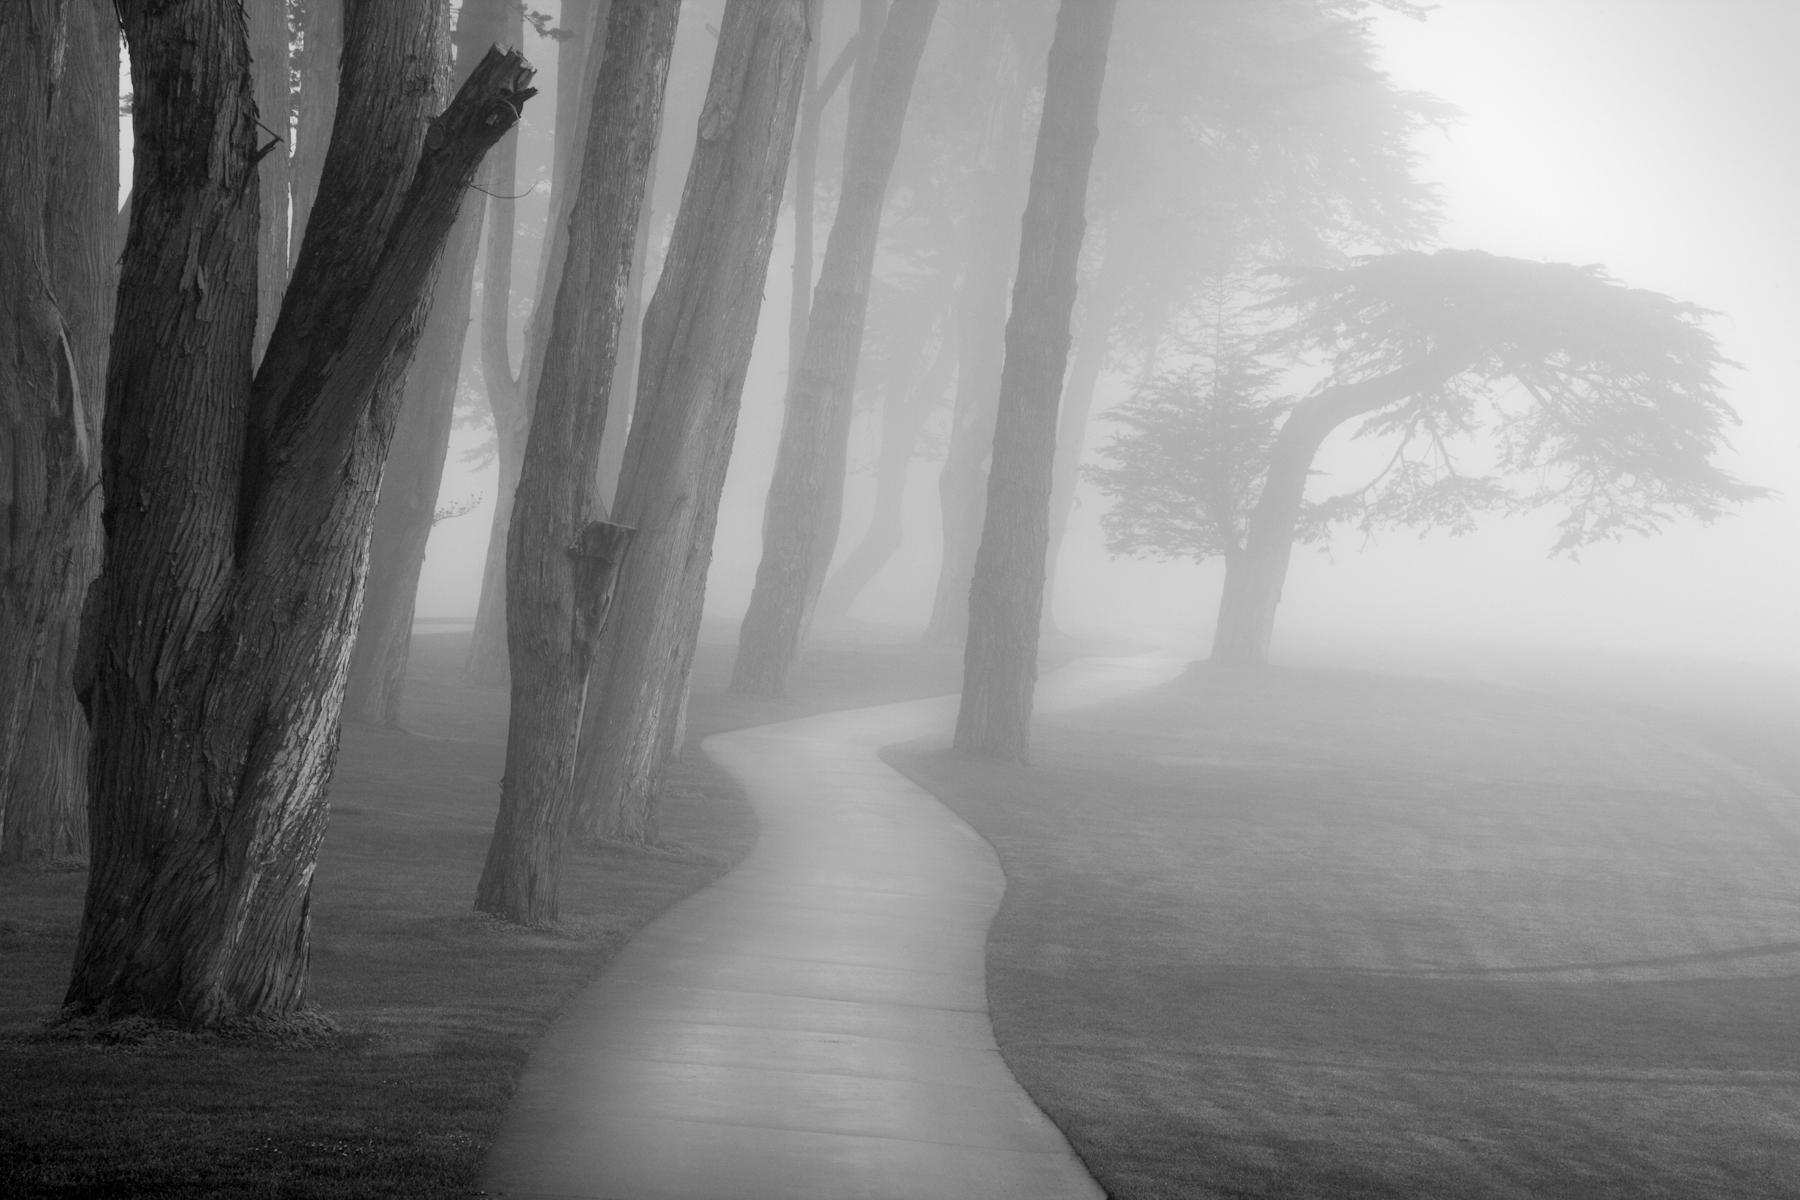 Fog Trees Wallpaper Park Trees Path Trail Fog Mist